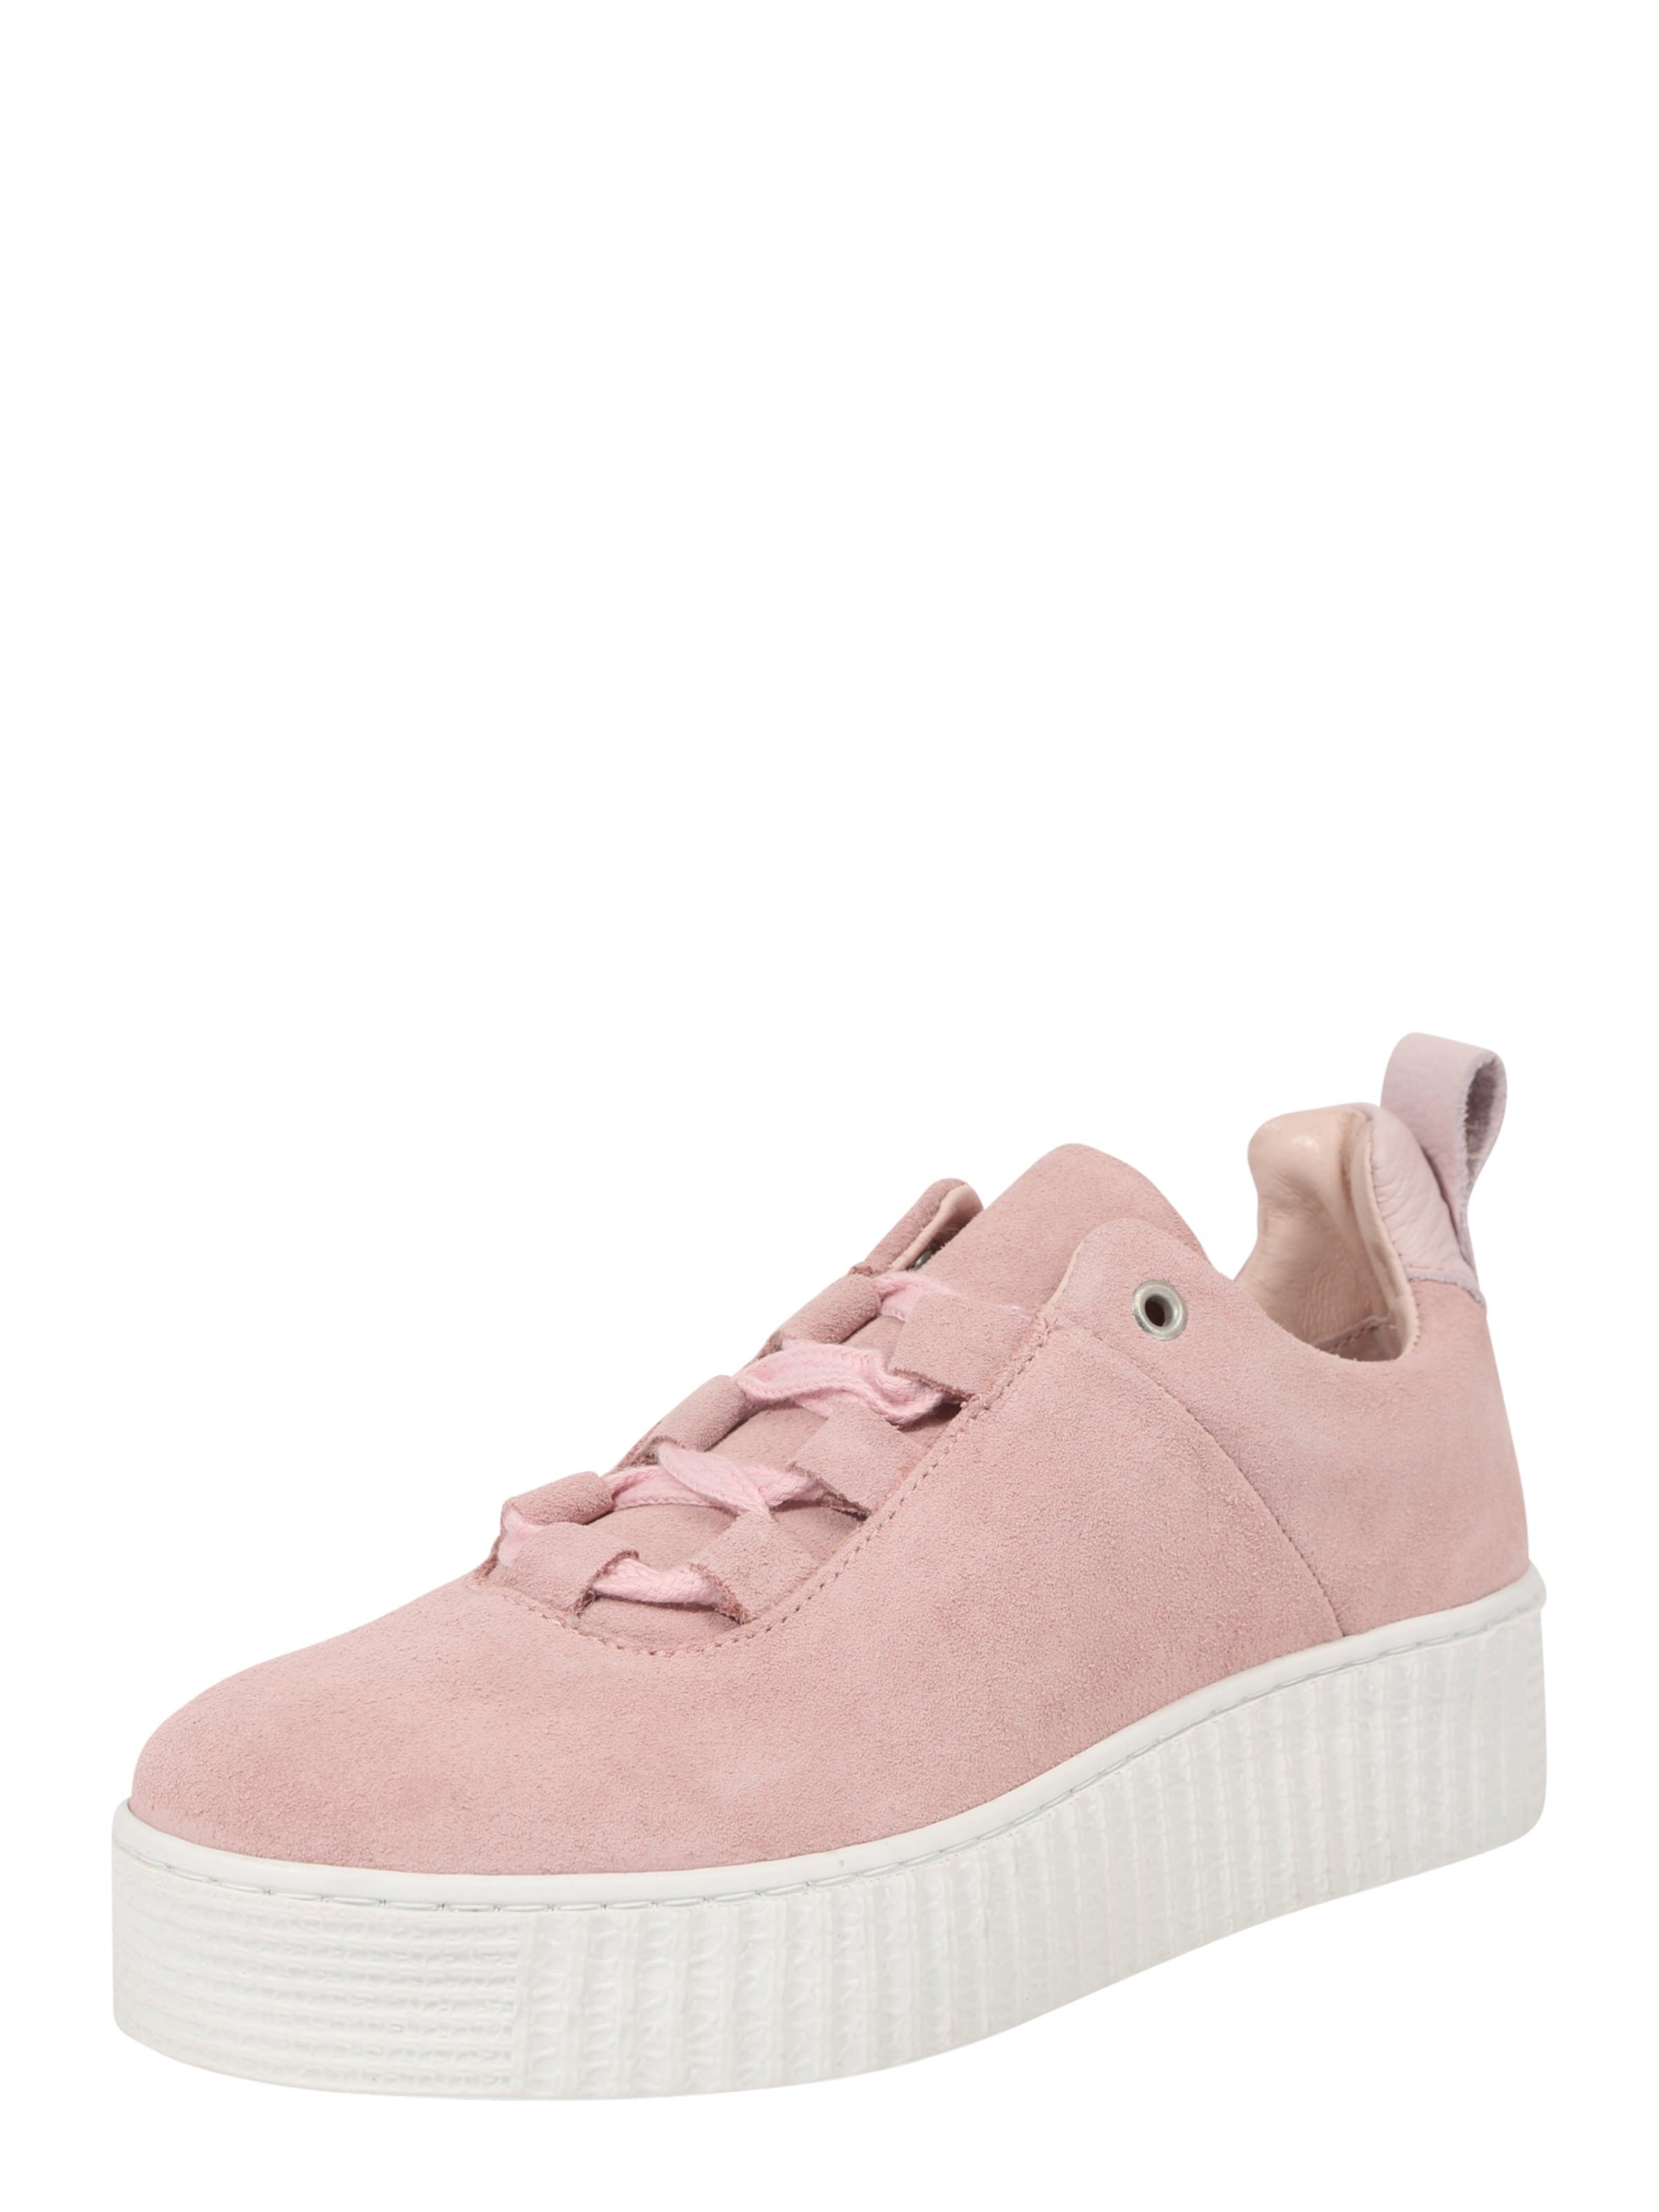 Samsoe & Samsoe Sneaker Verschleißfeste billige Schuhe